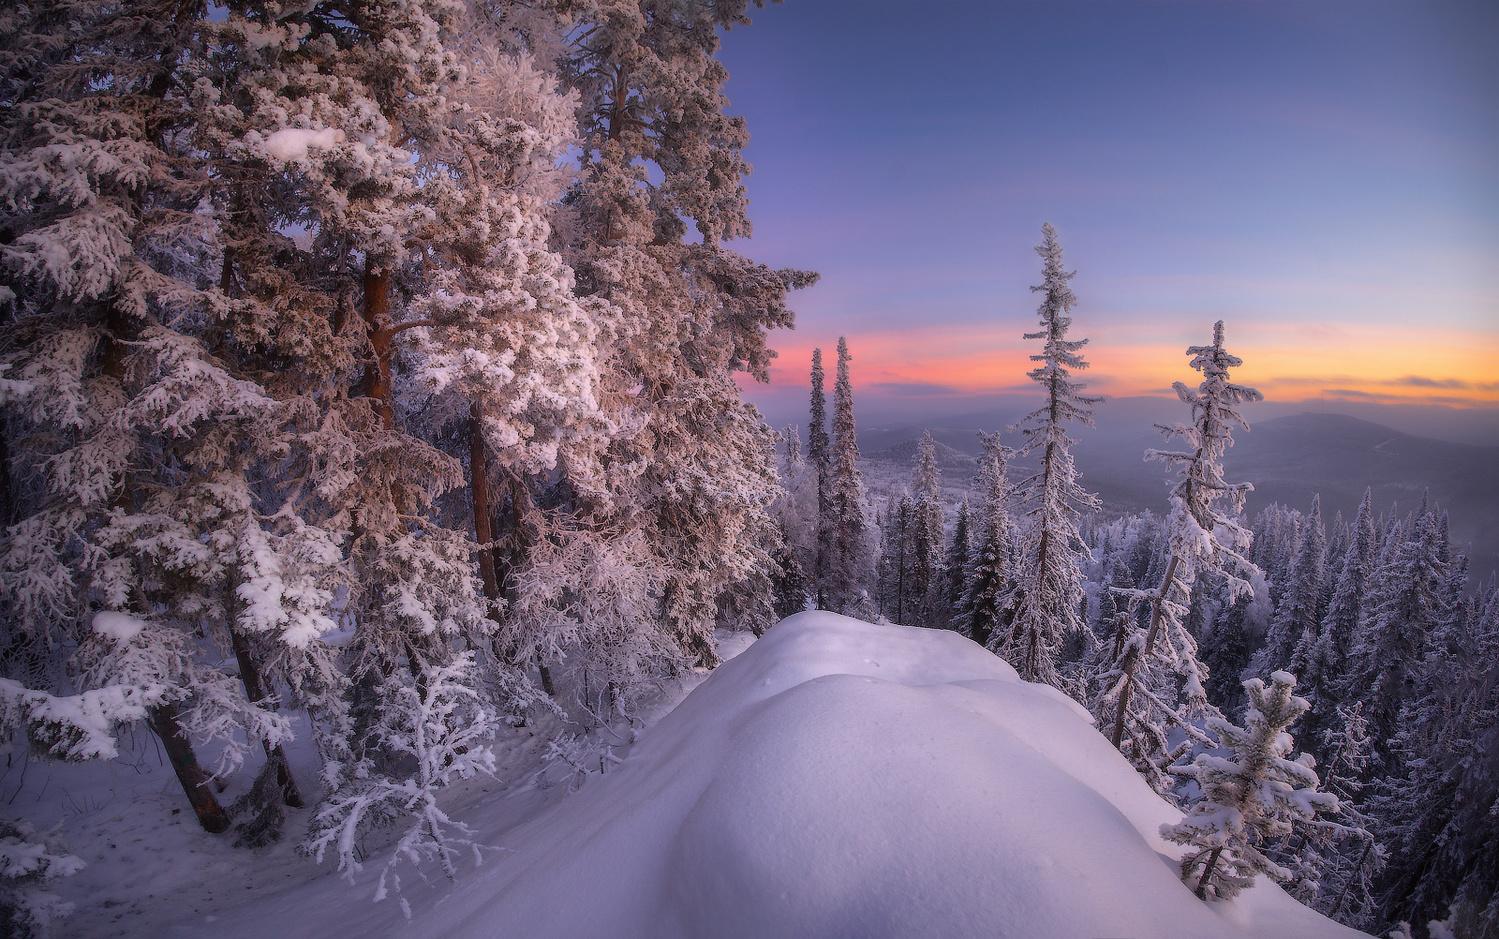 In the morning by Vladimir Lyapin